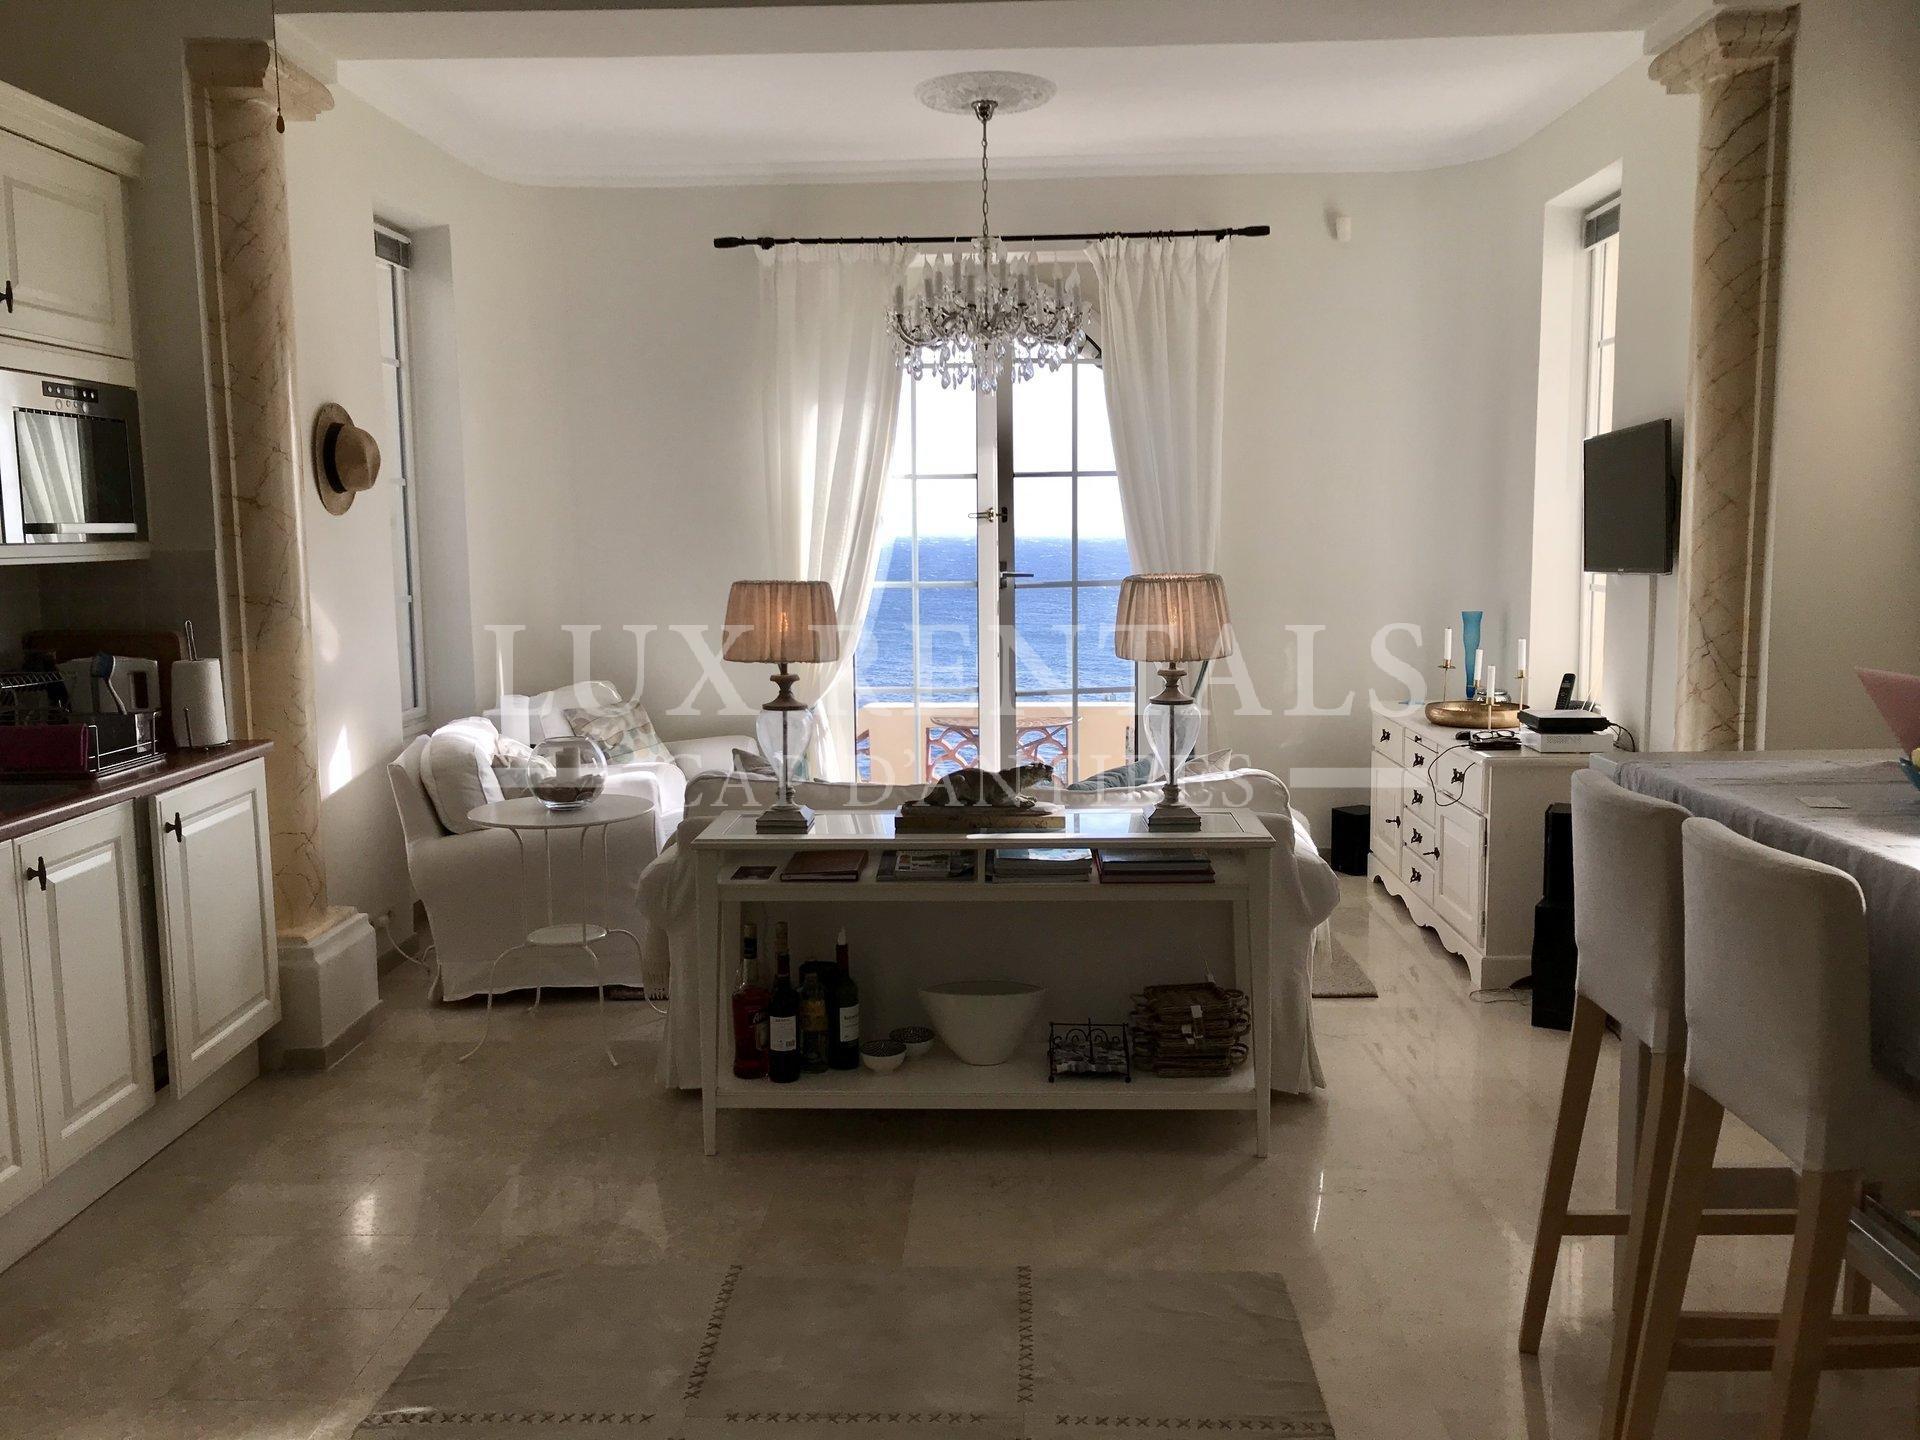 Сезонная аренда Квартира - Антиб (Antibes) Cap-d'Antibes